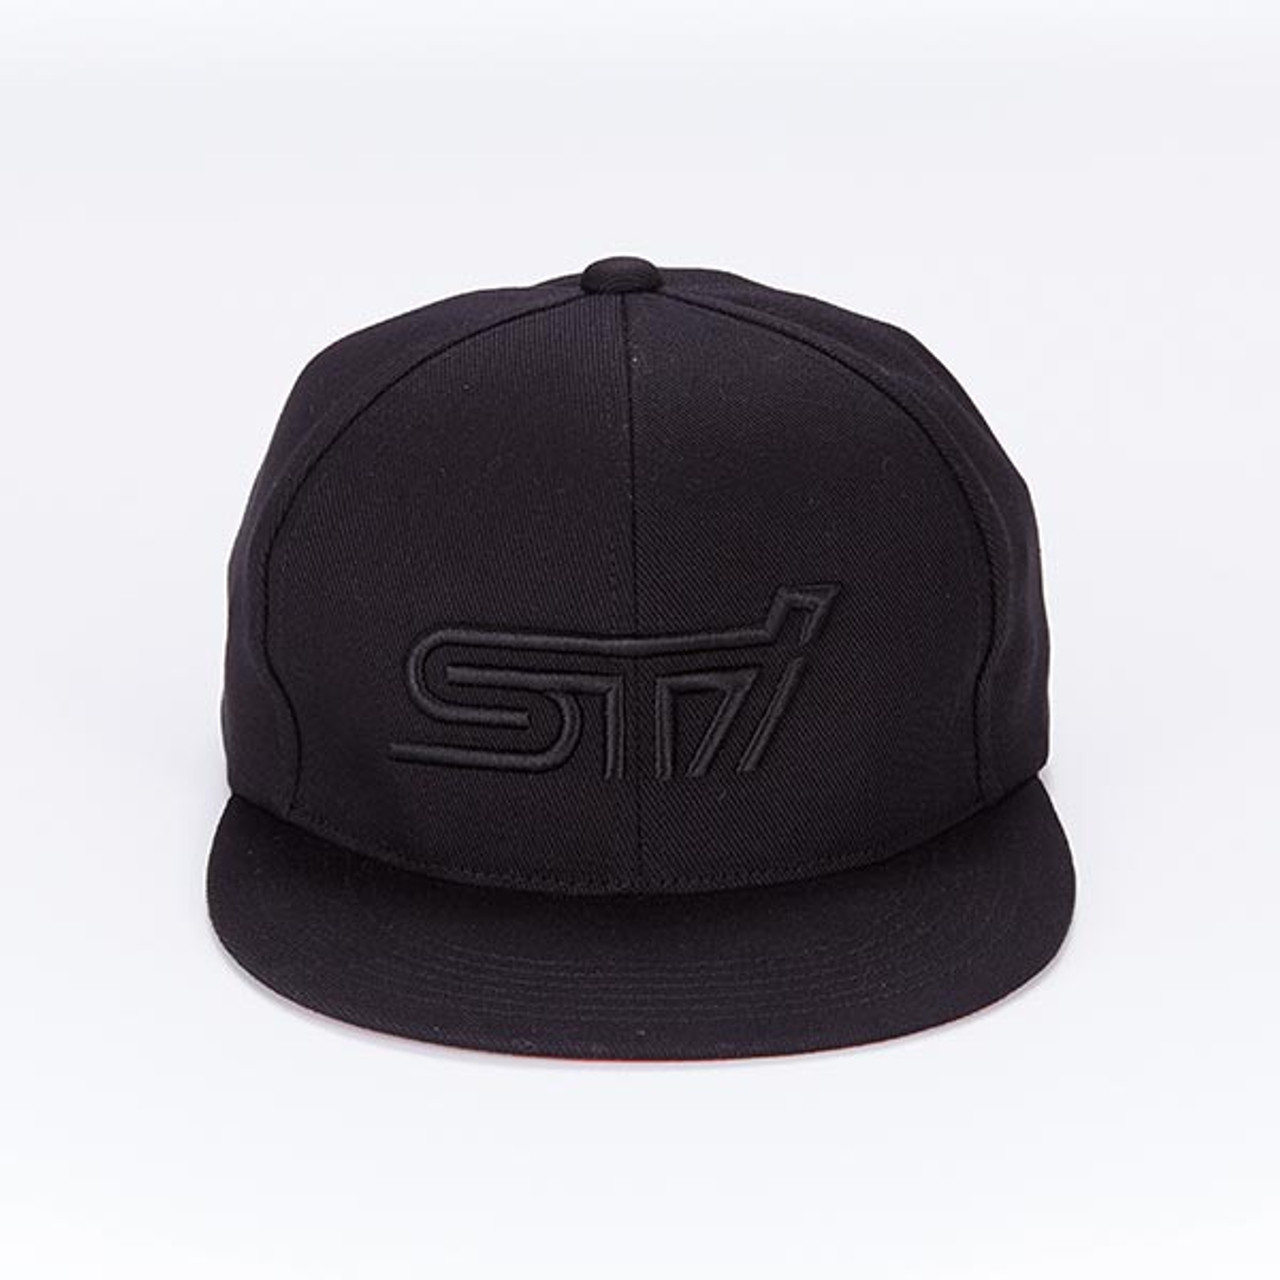 STI Flat Cap STSG18100420 front at AVOJDM.com